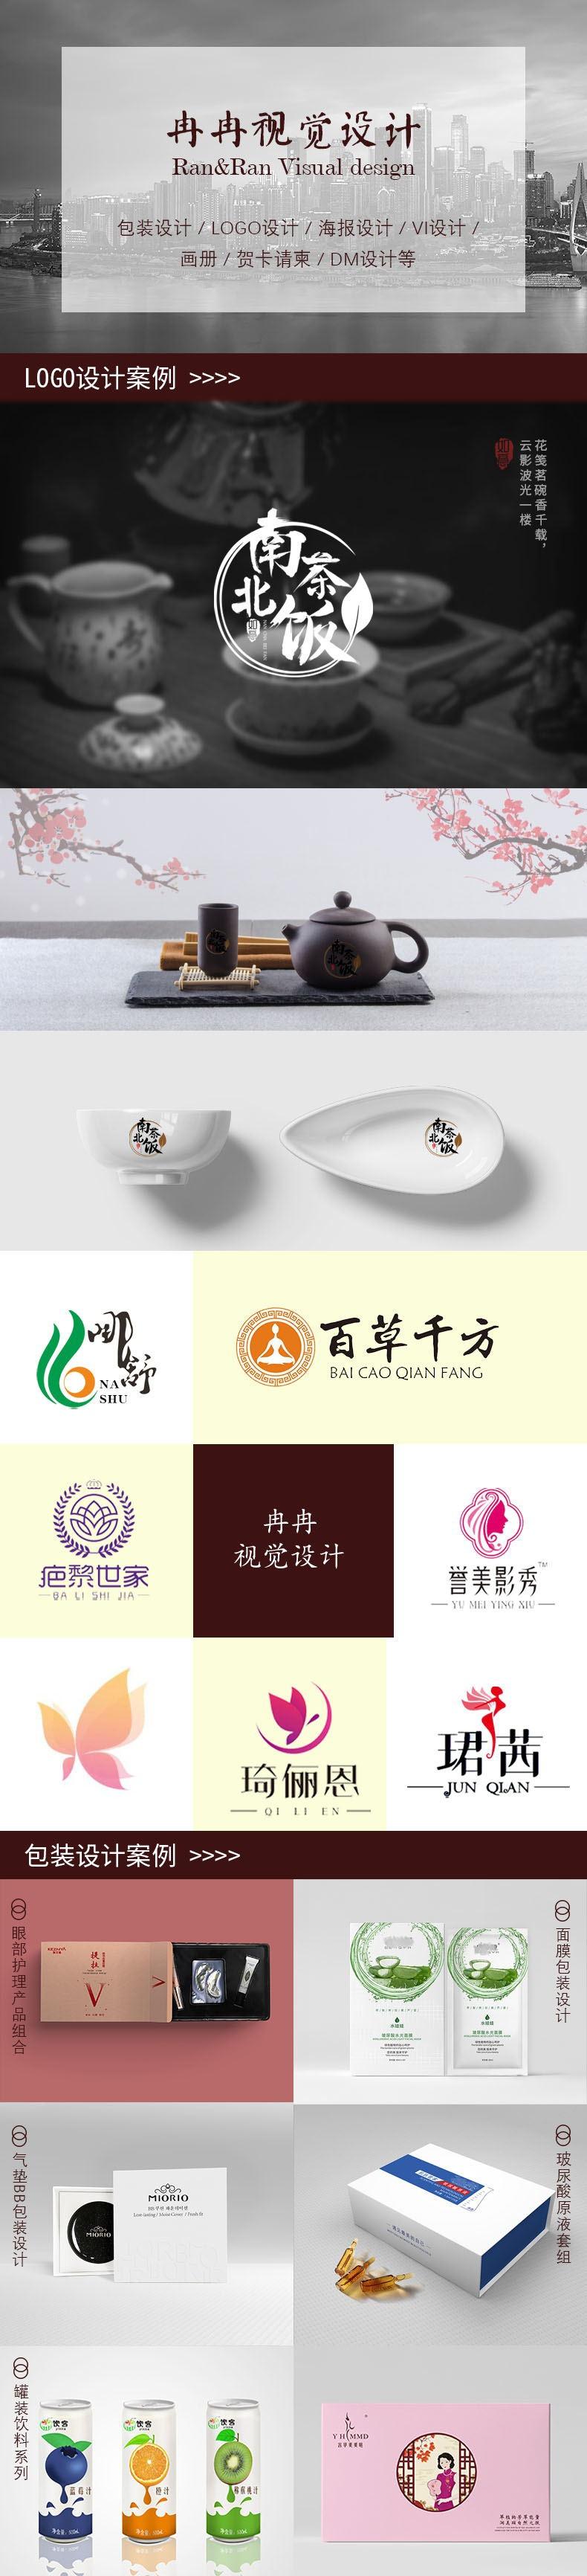 LOGO设计与包装设计案例